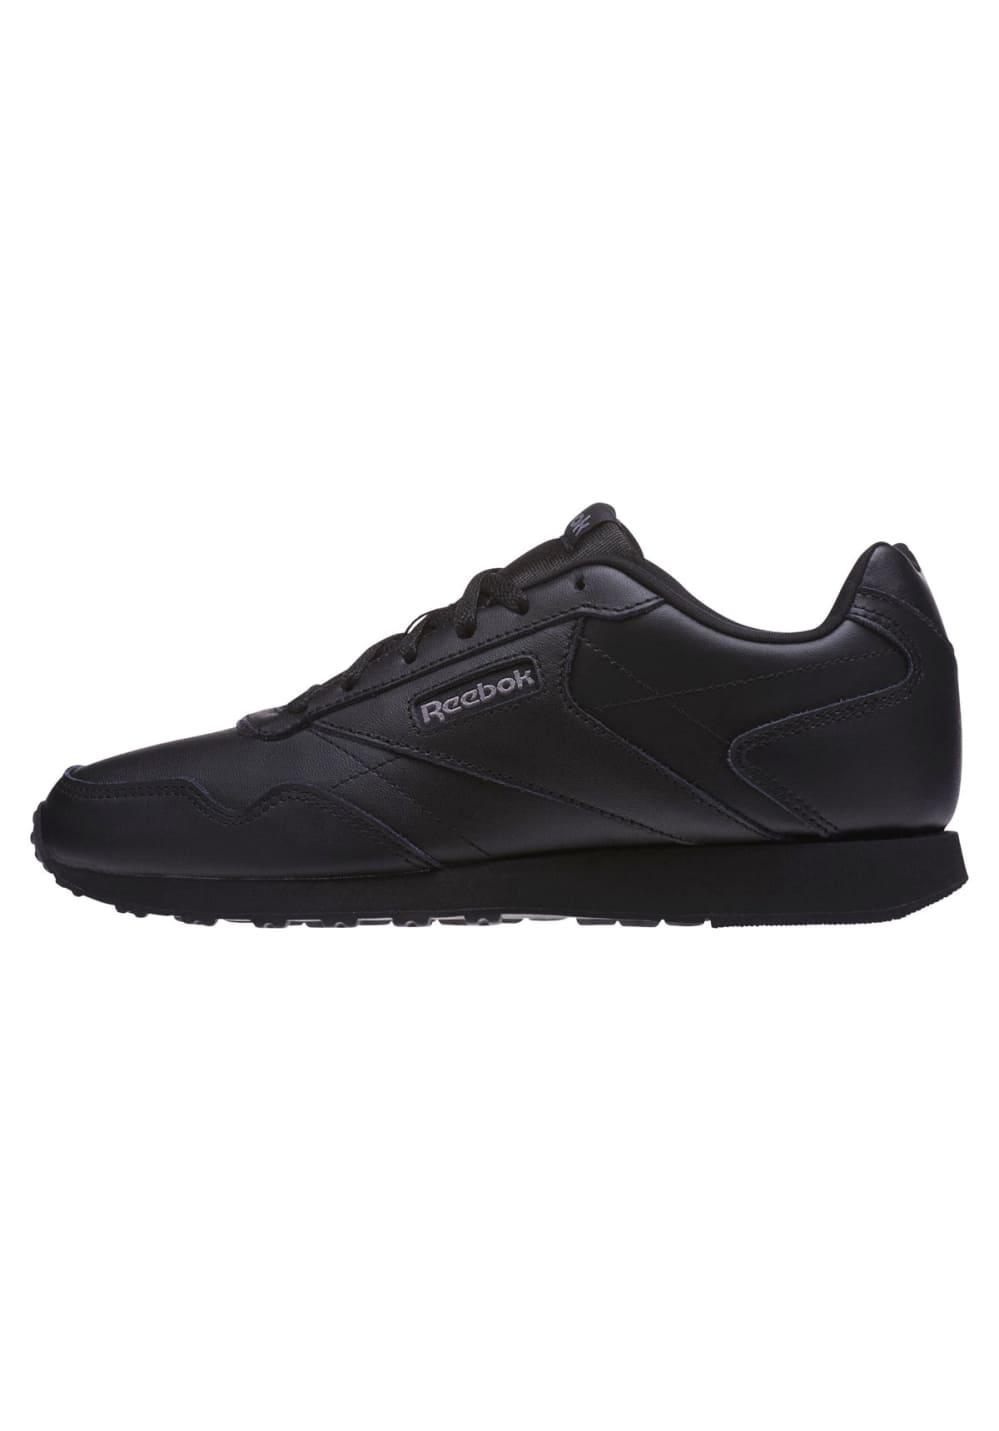 f42612688 Reebok Royal Glide Lx - Zapatillas de fitness para Mujer - Negro